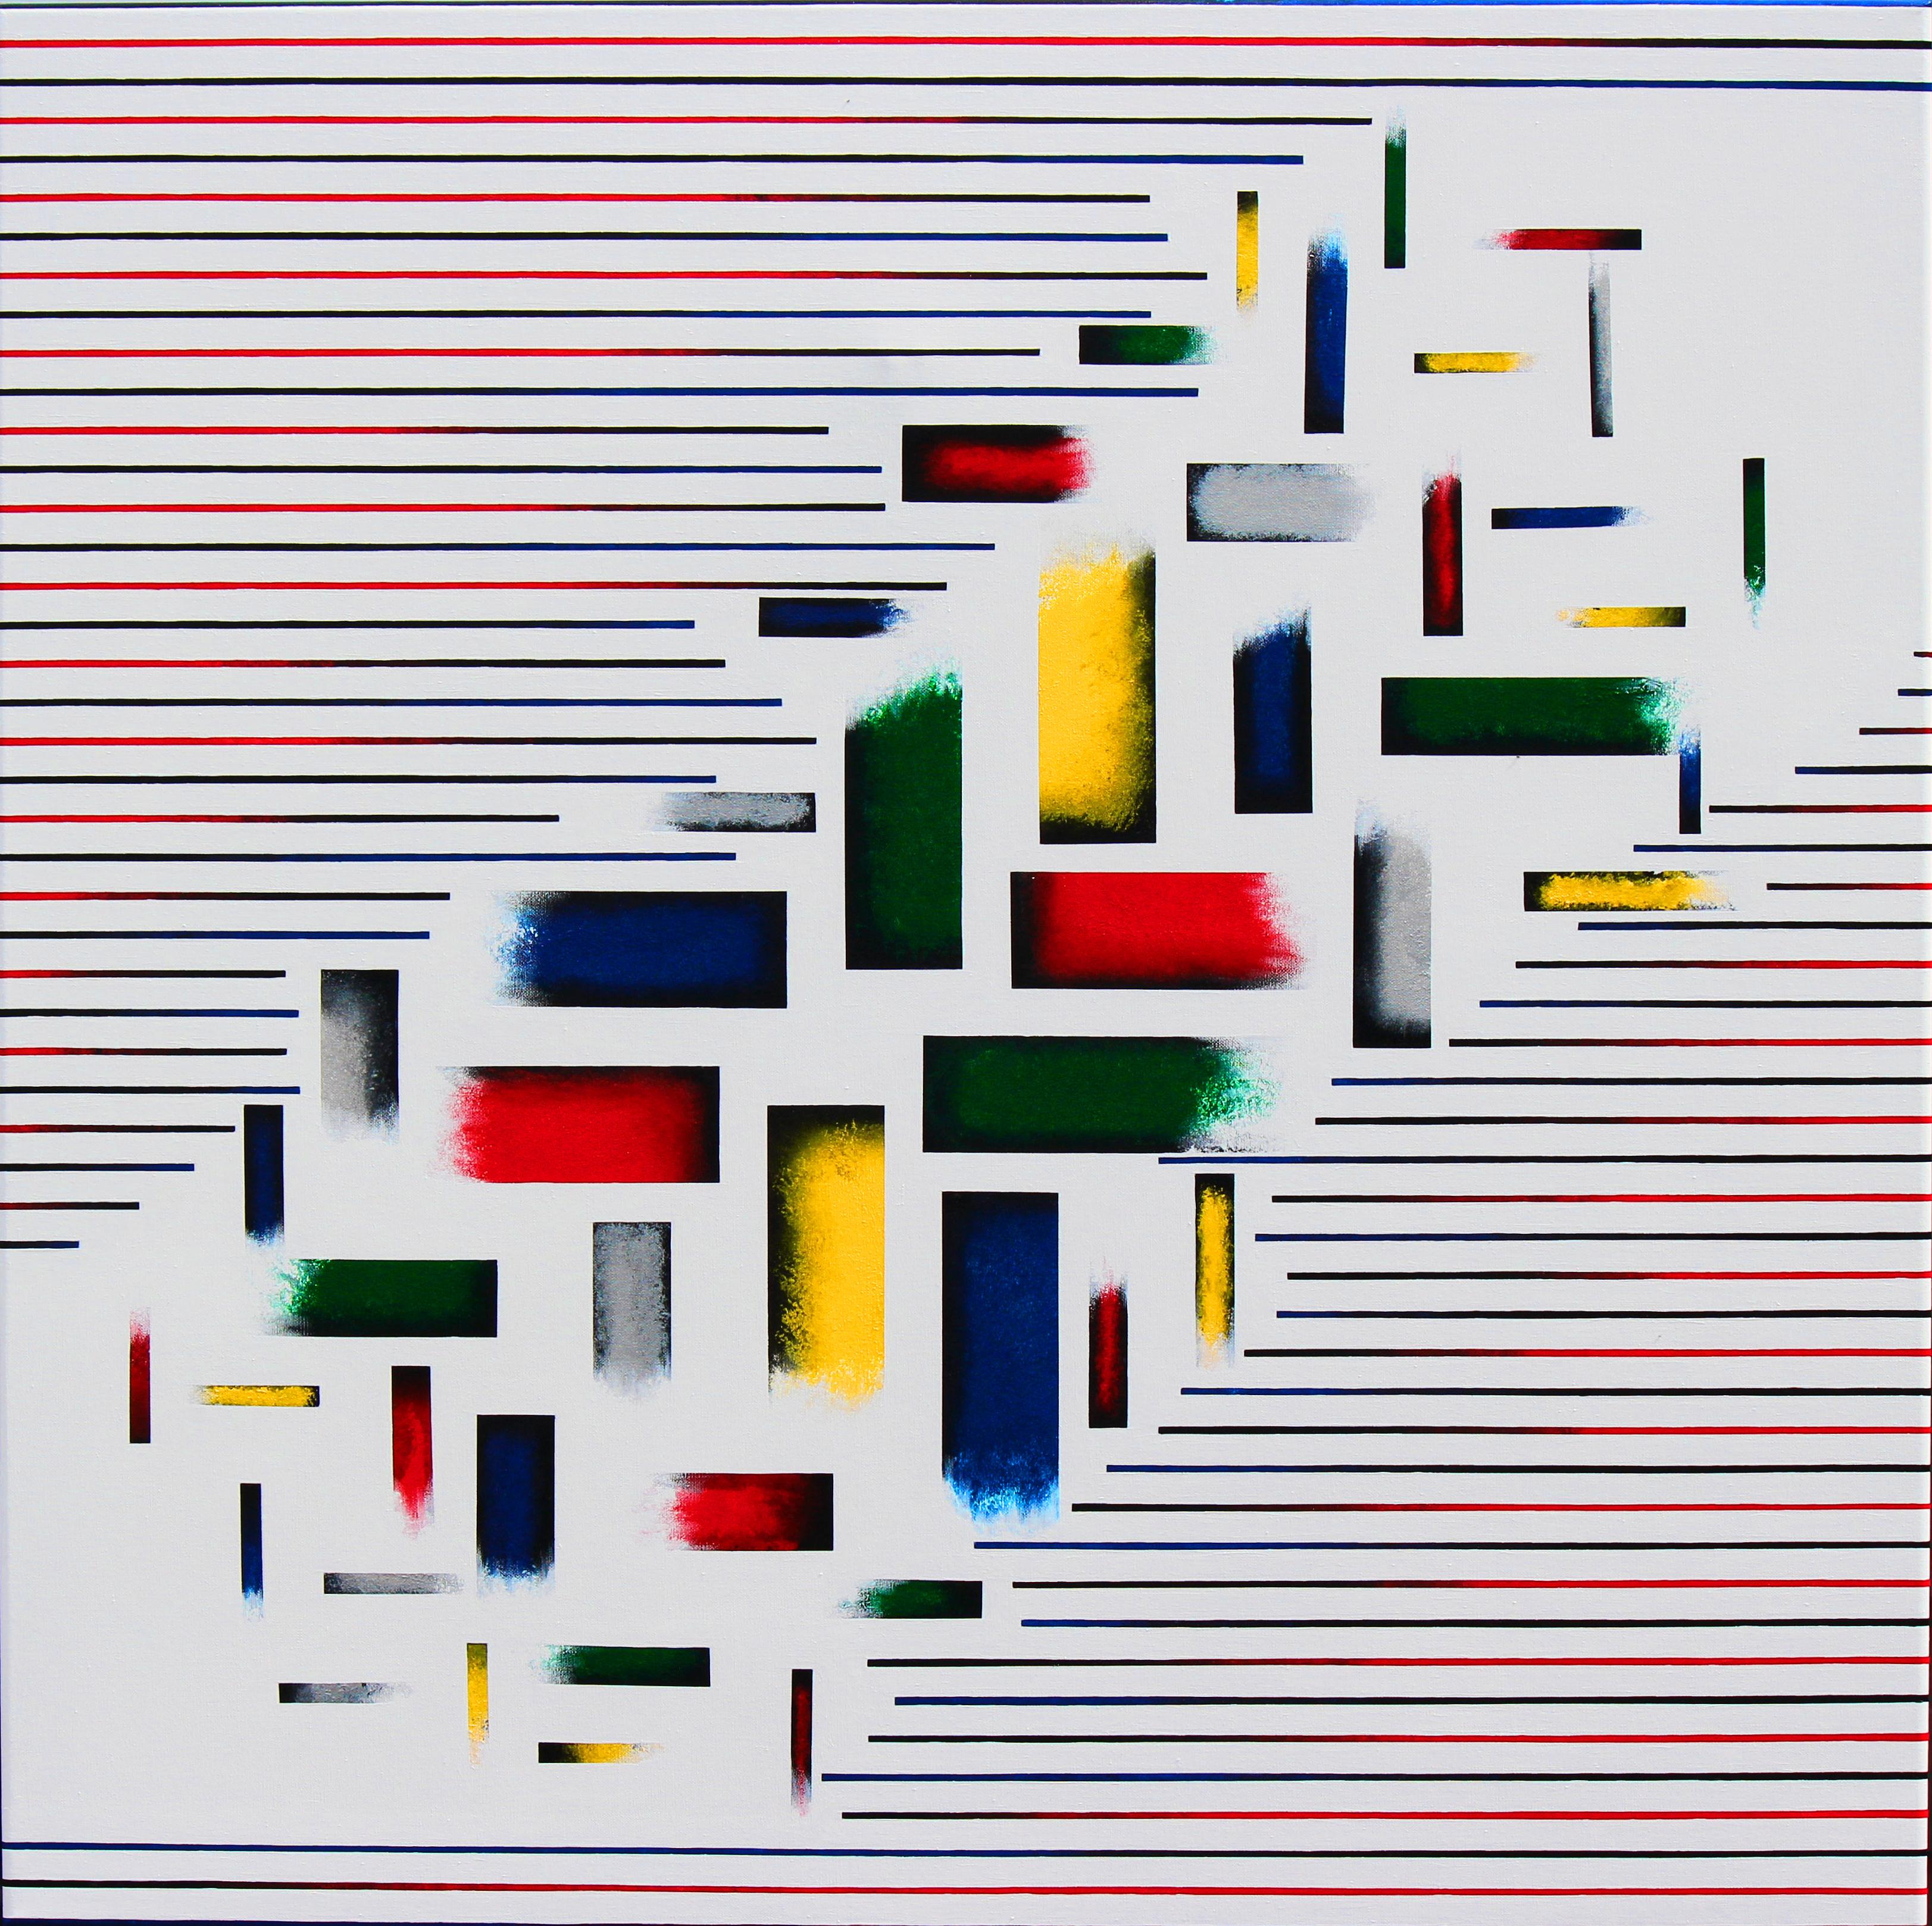 Acrylic painting. Inspiration.Size 100 cm x 100 cm